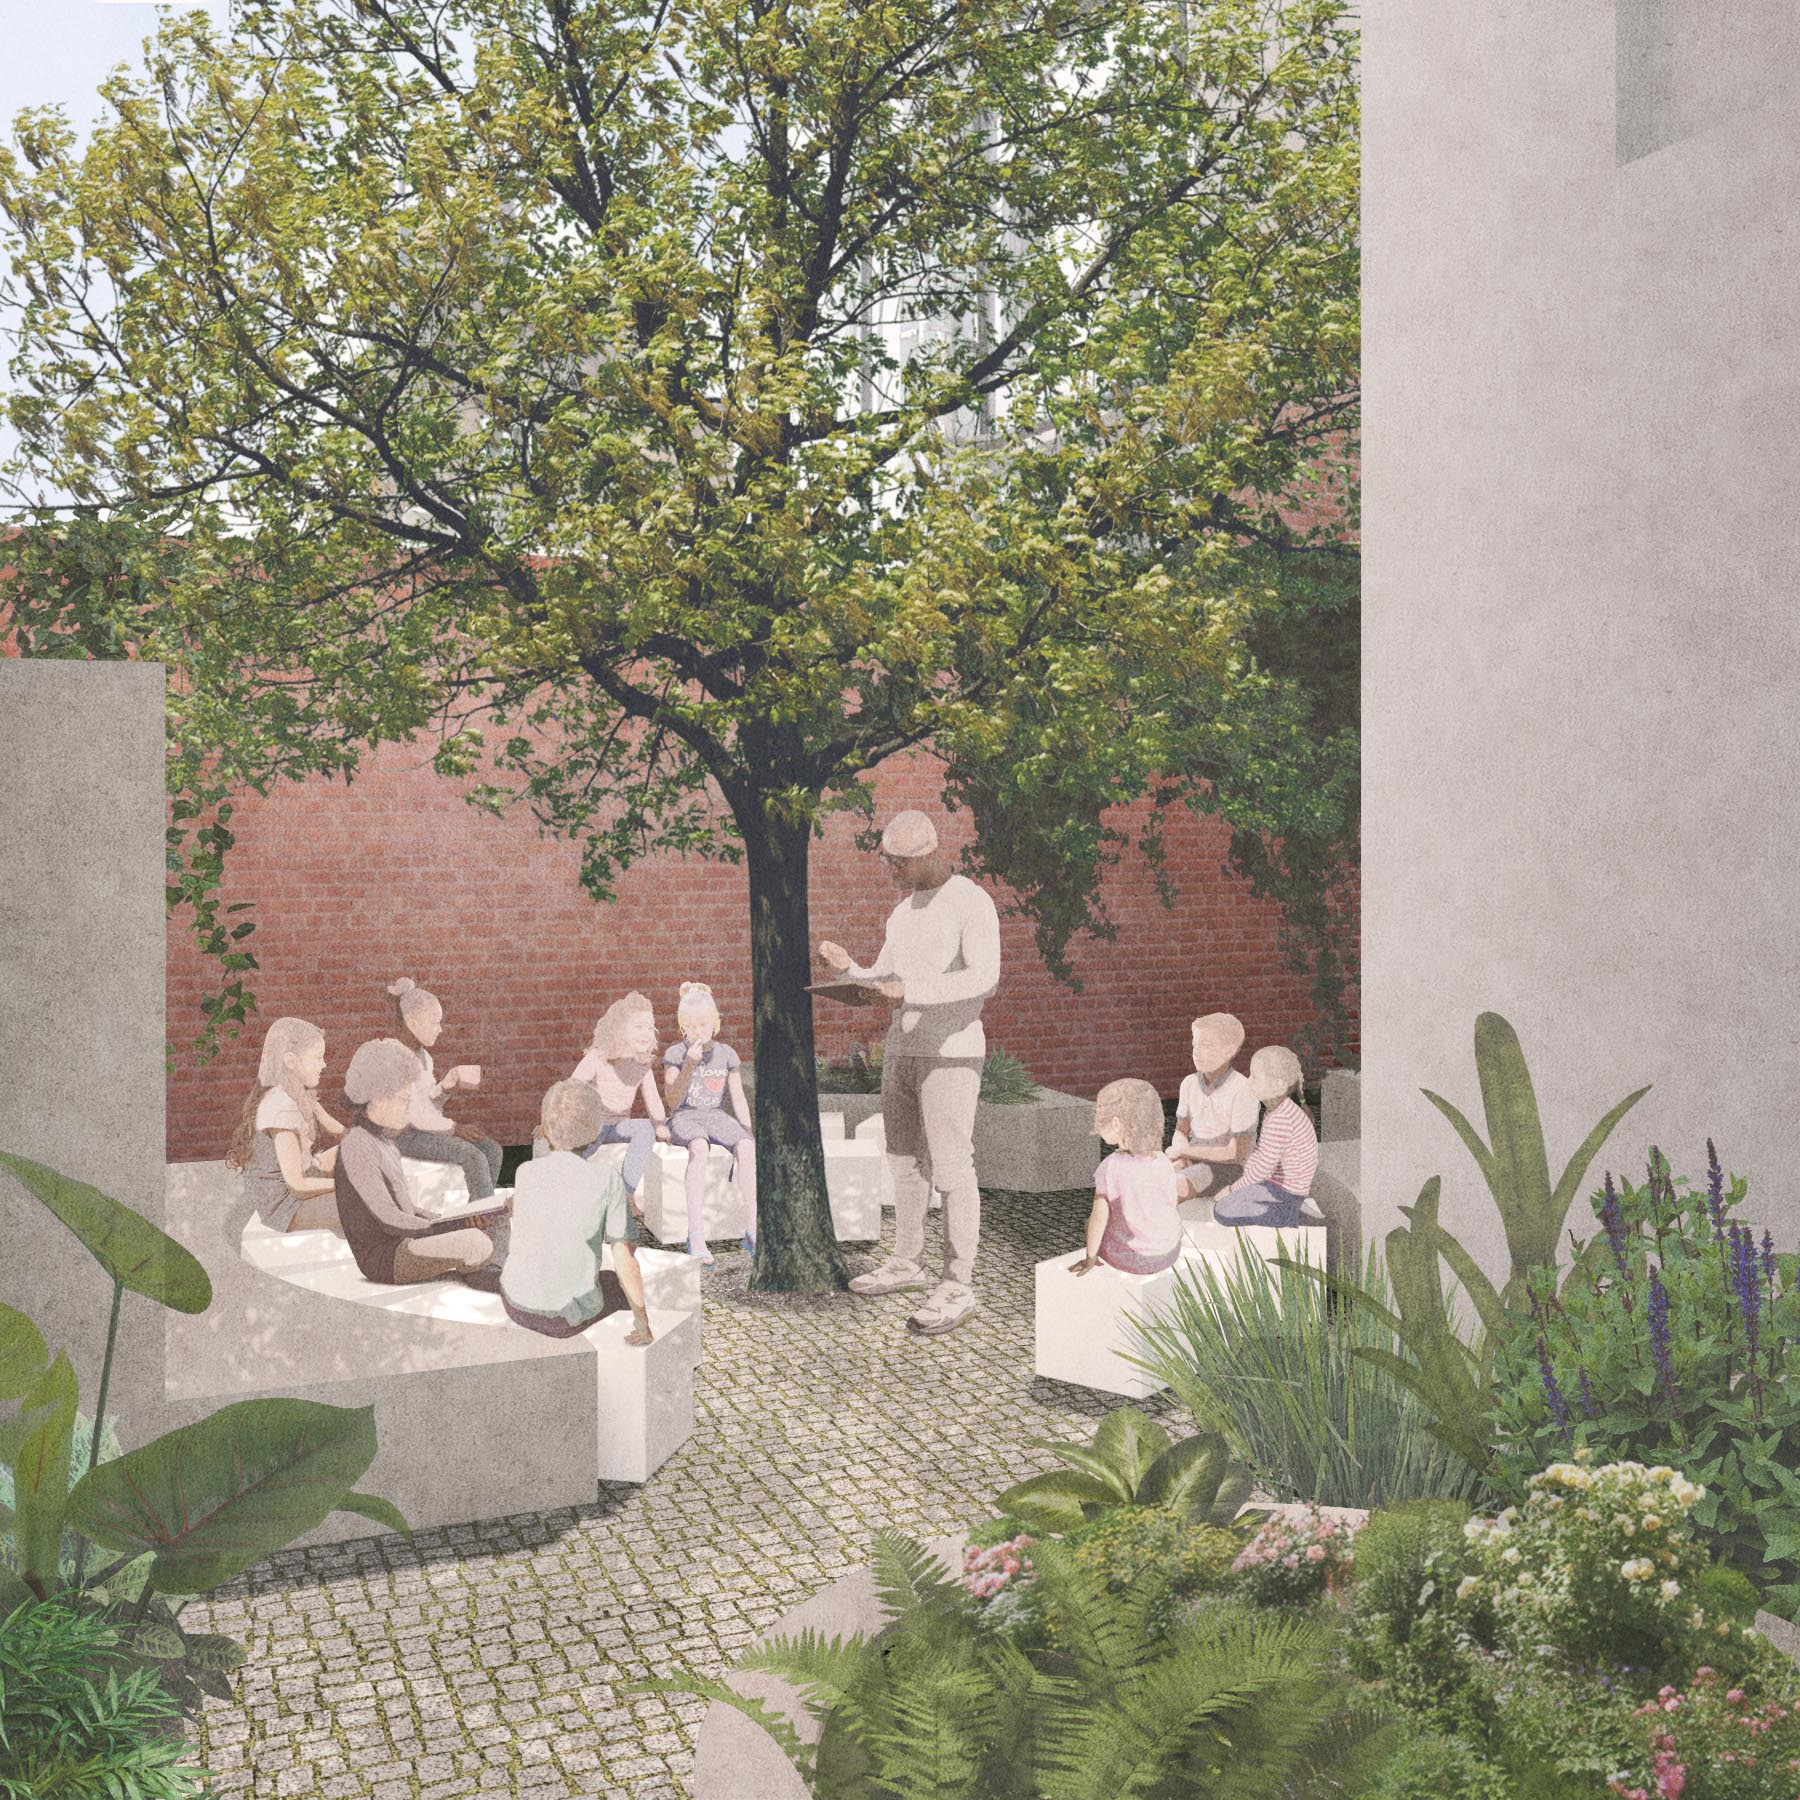 Cultivate a Community Garden